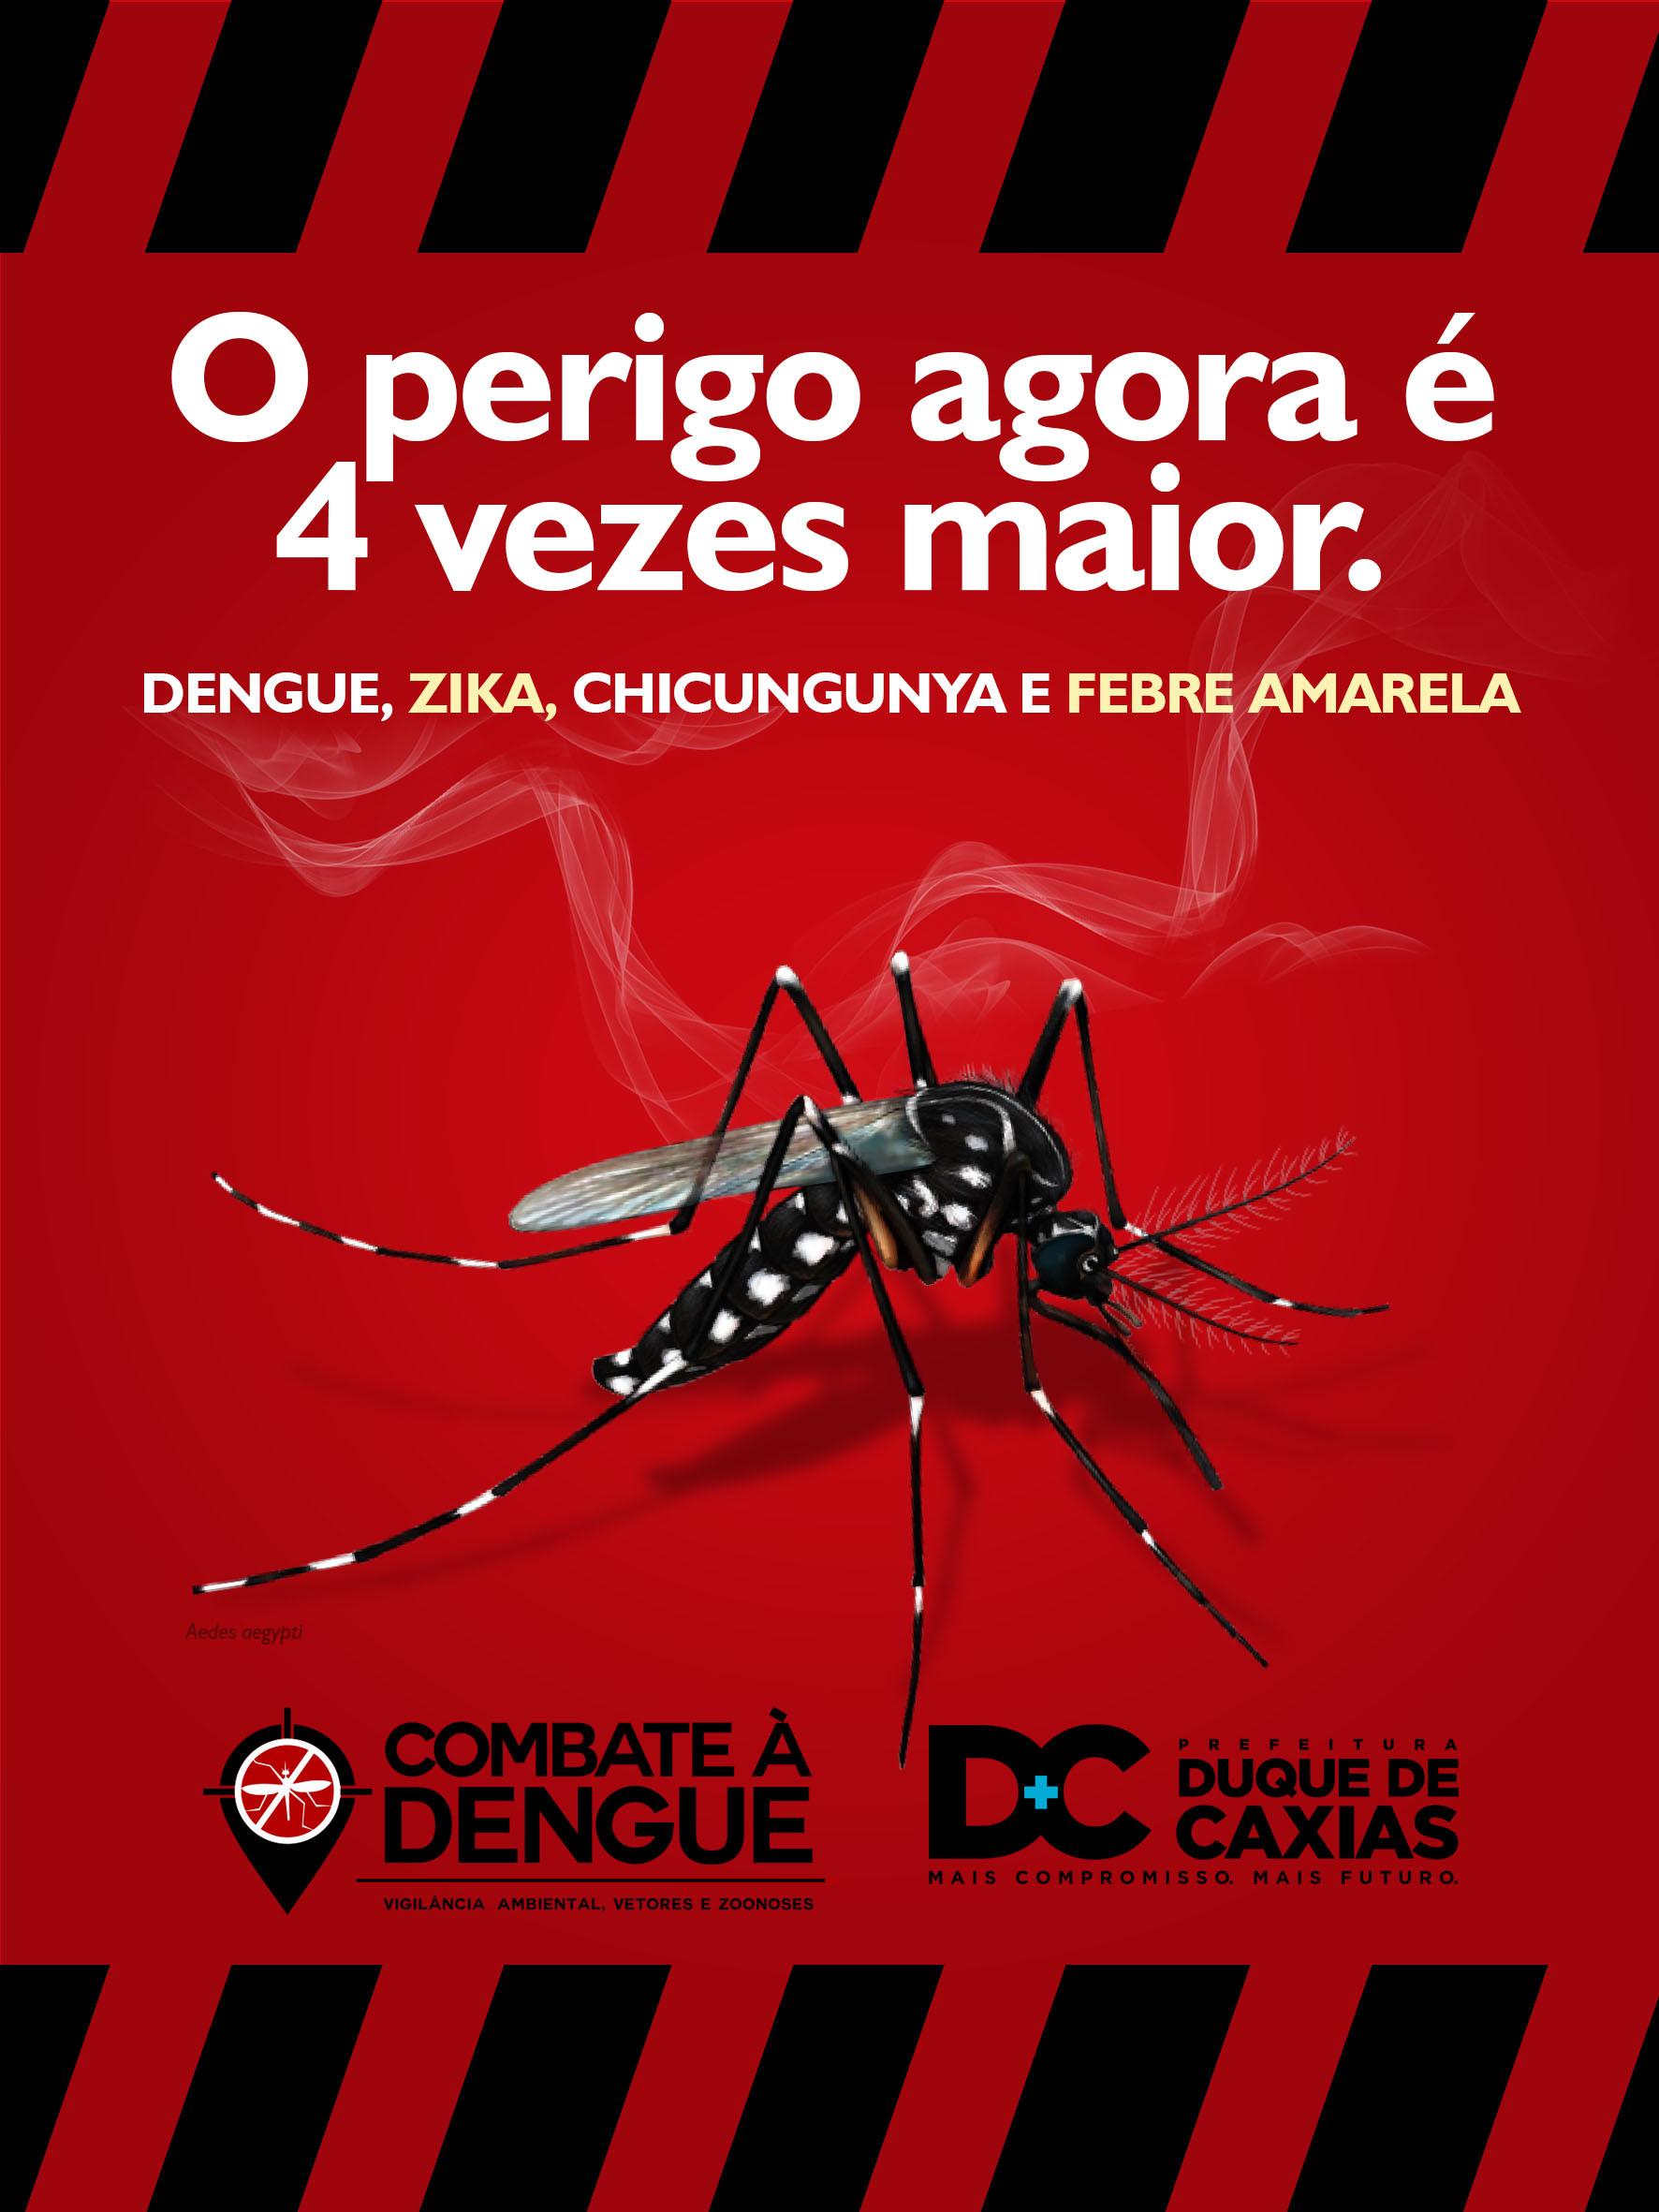 Leandro calazans cartaz dengue